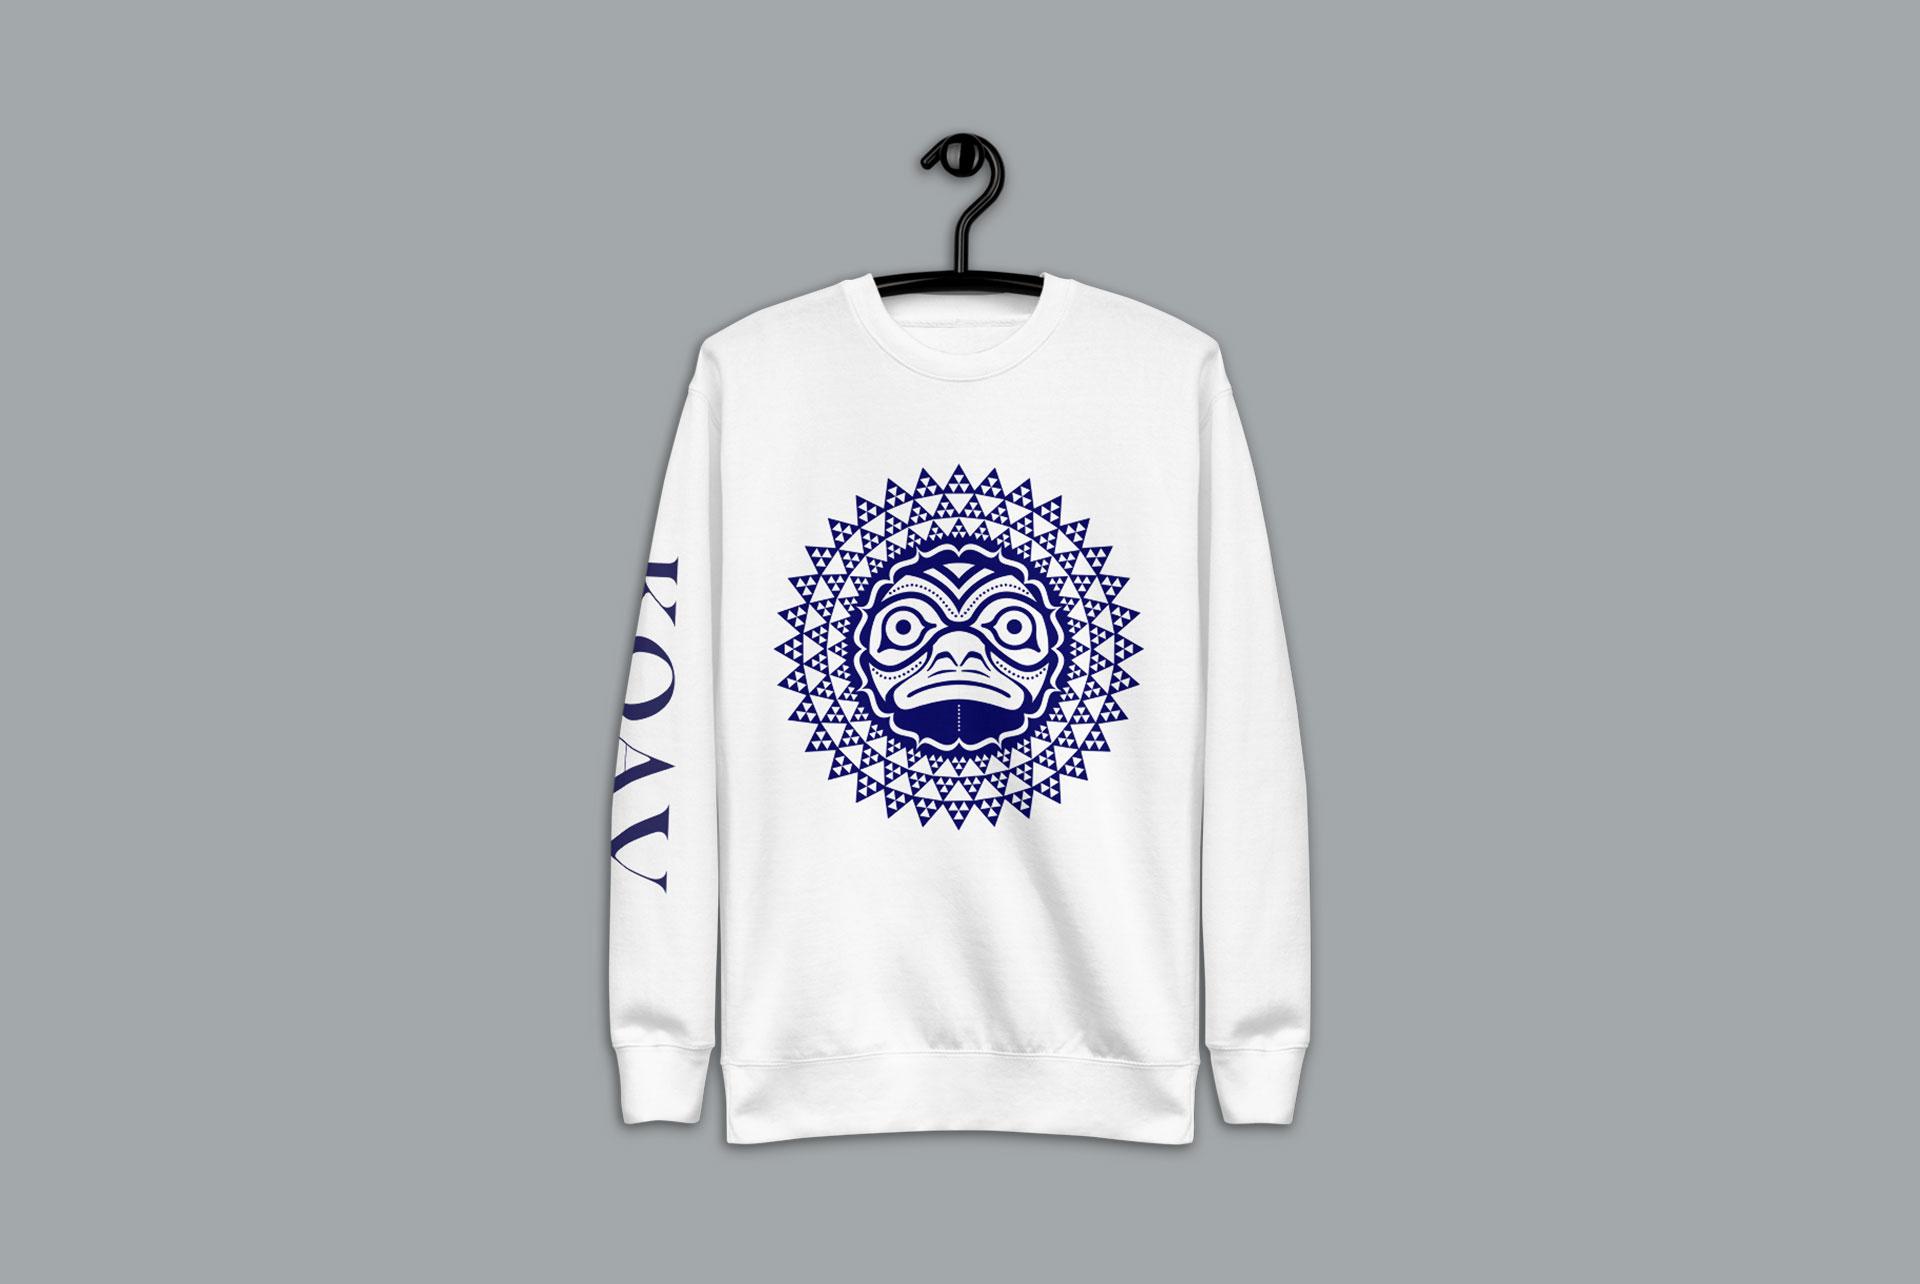 KOA Kuleana premium fleece pullover sweater by KOAV